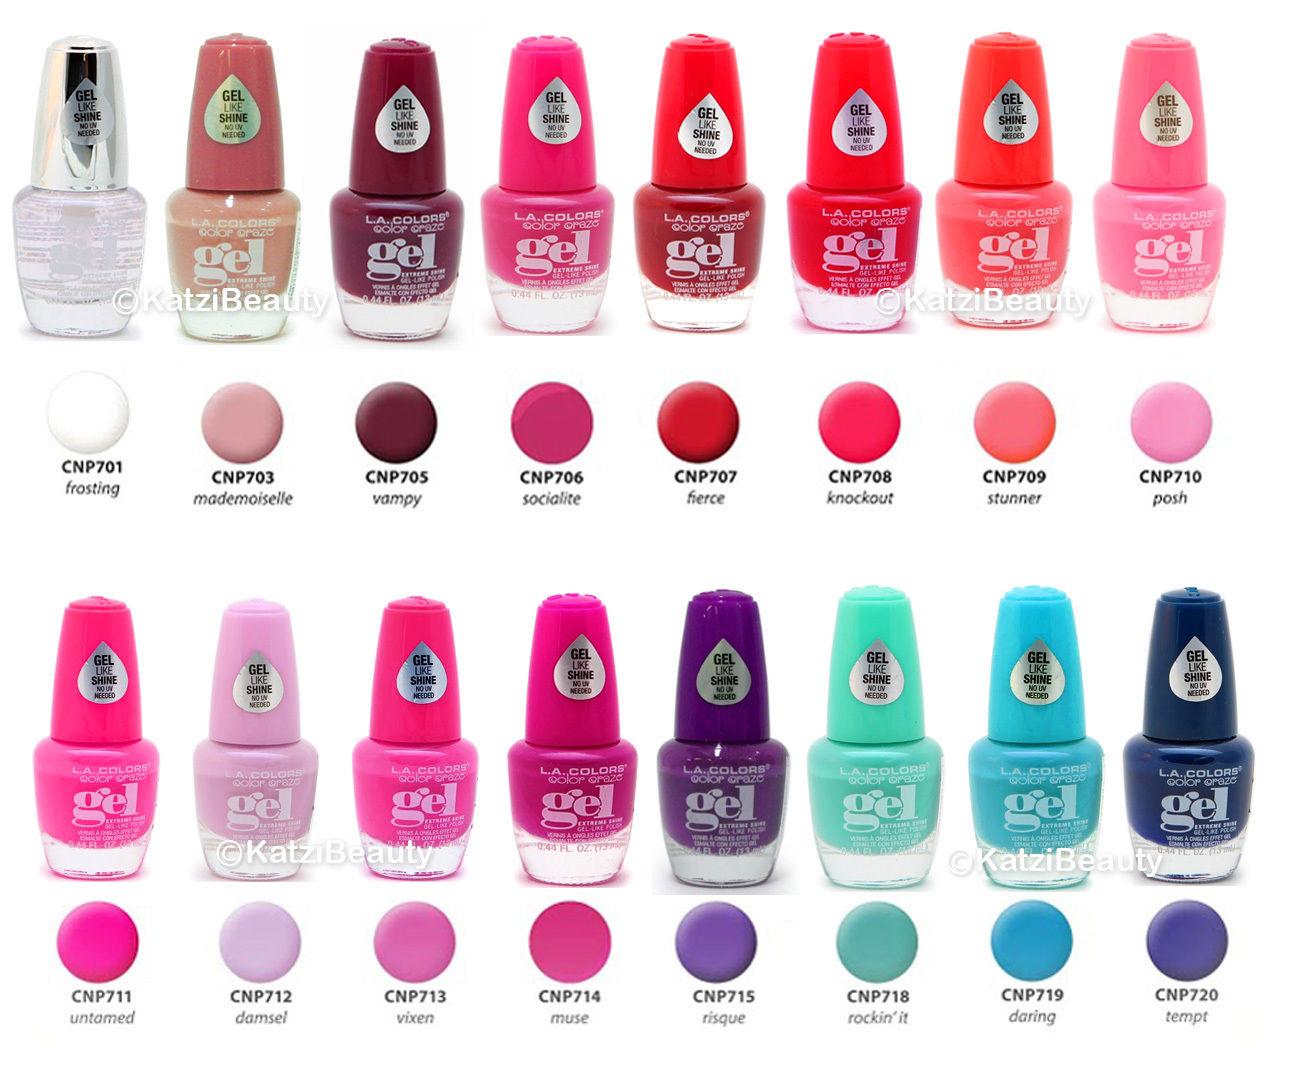 1 99 La Colors Color Craze Extreme Shine Gel Nail Polish Buy 3 Free U S Shipping Ebay Fashion La Colors Nail Polish Gel Nail Polish Remove Gel Polish